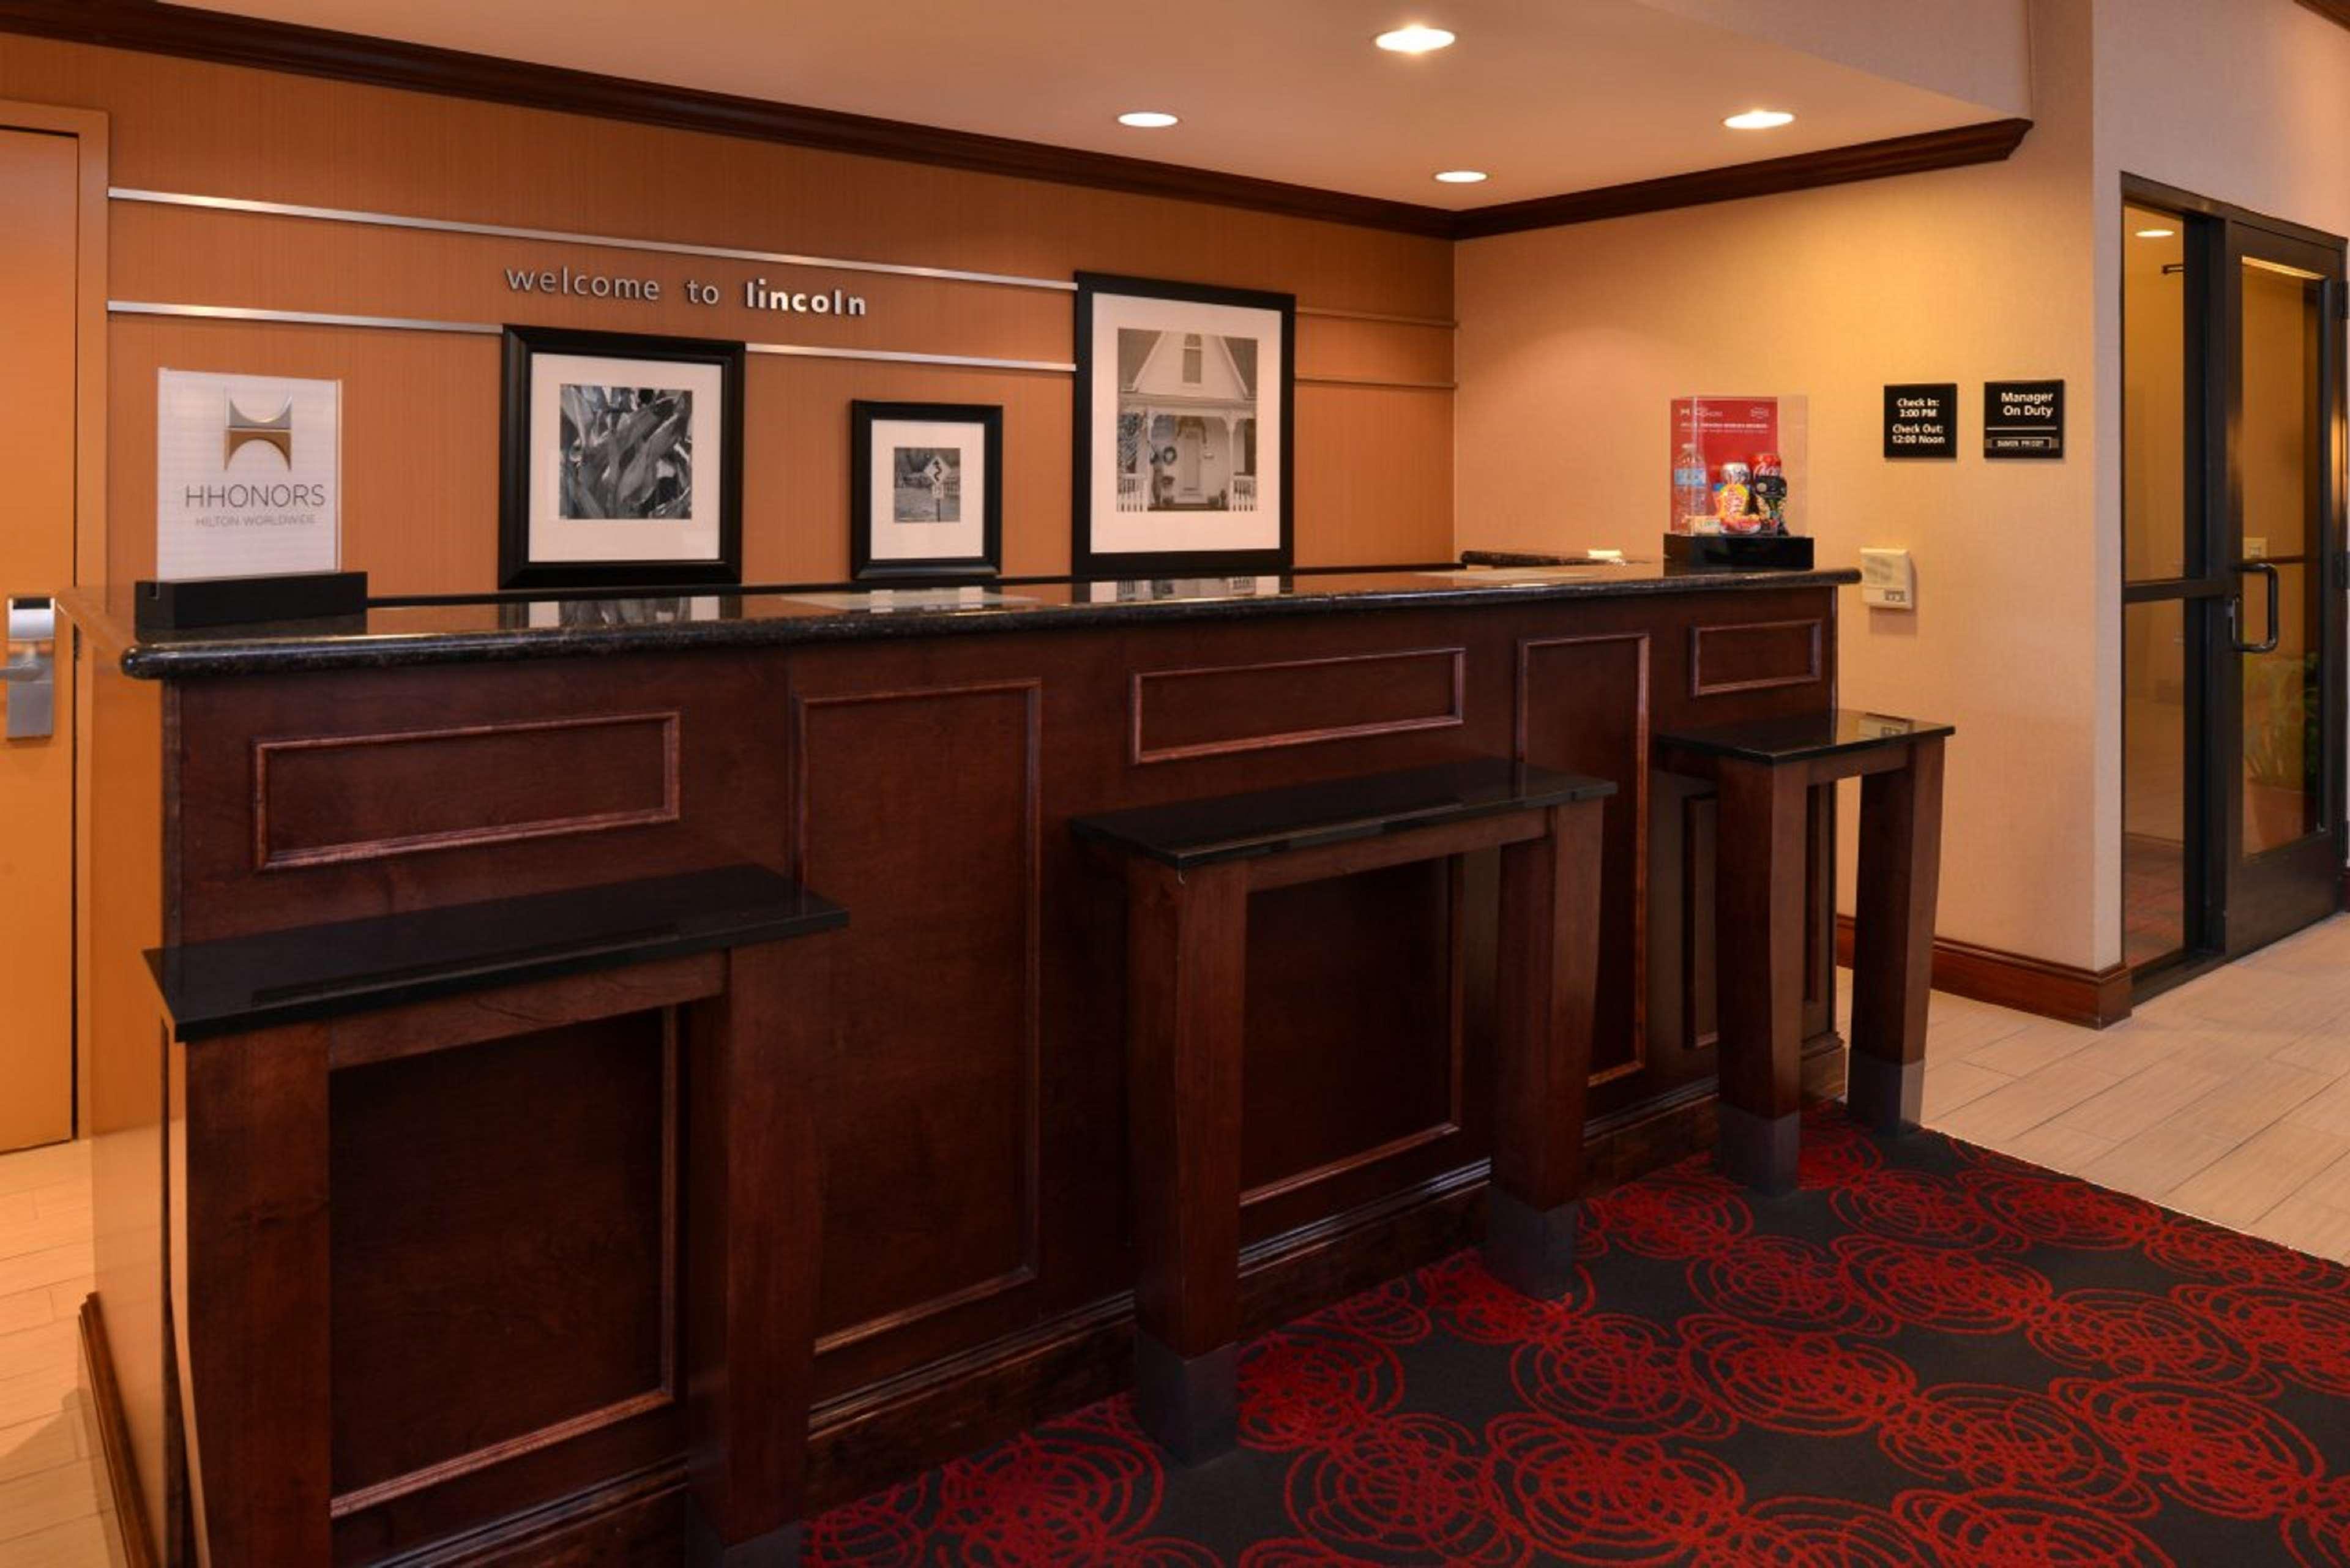 Hampton Inn Lincoln image 3